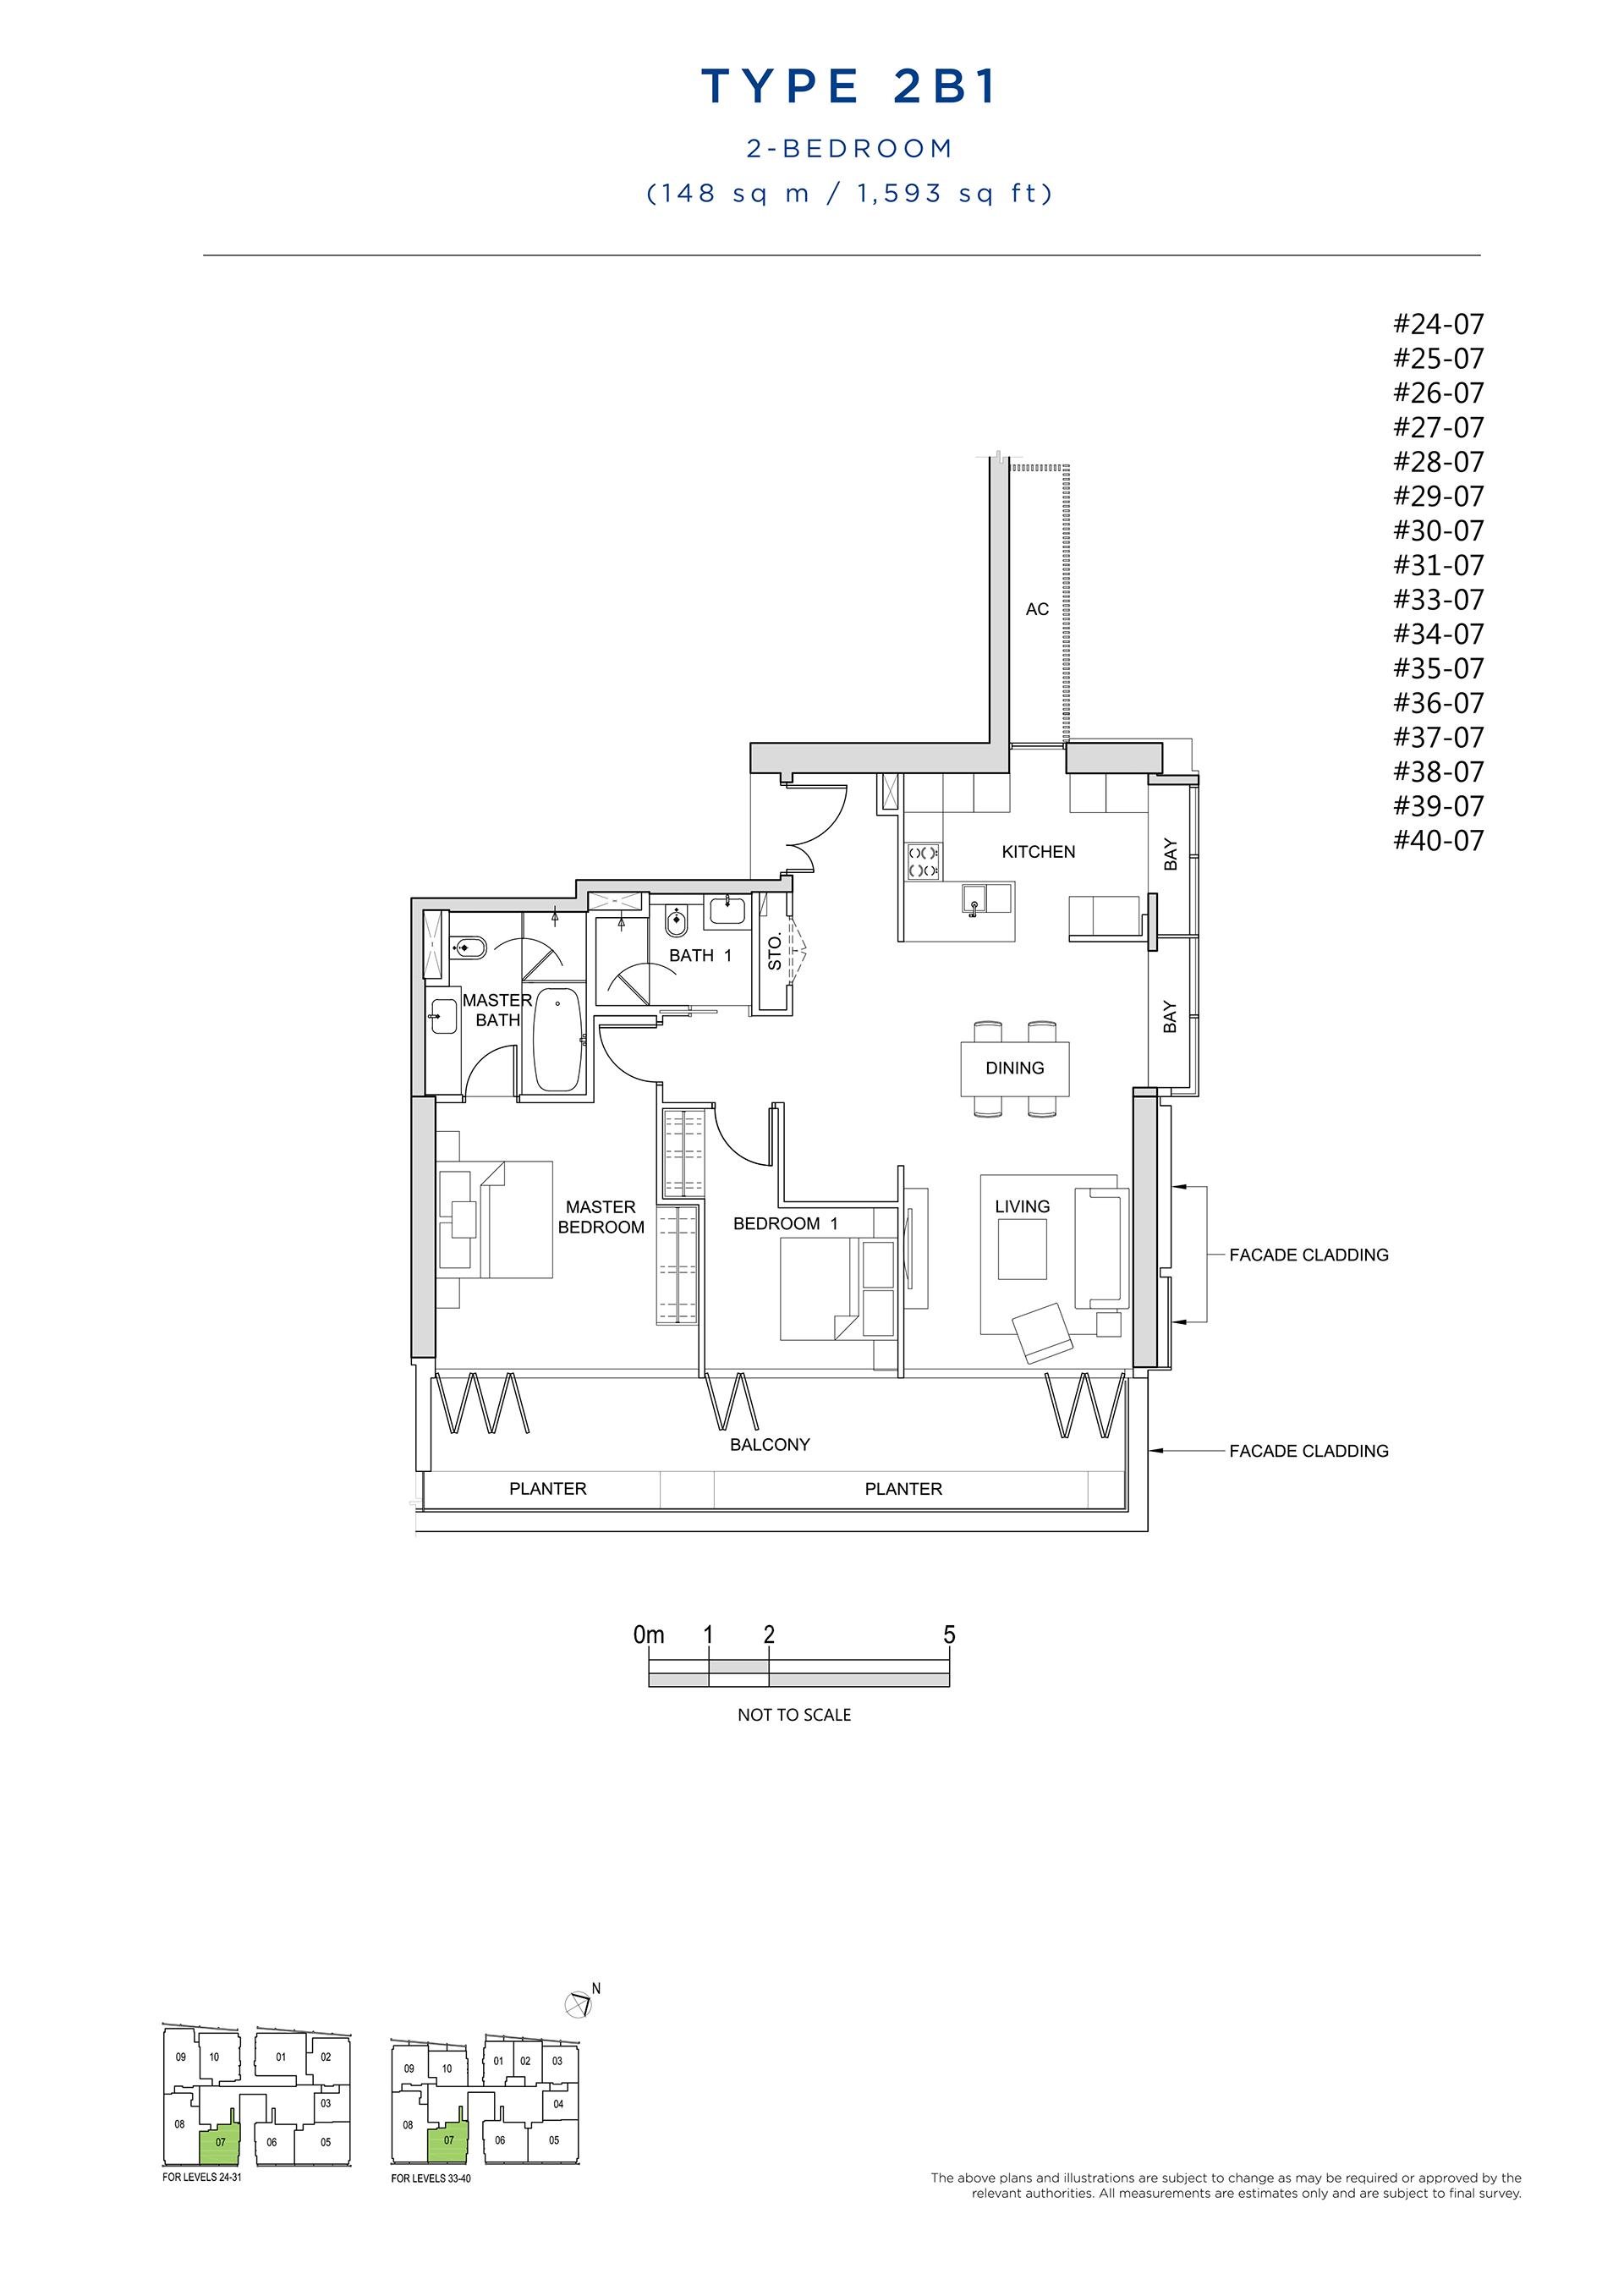 South Beach Residences 2 Bedroom Floor Plan Type 2B1